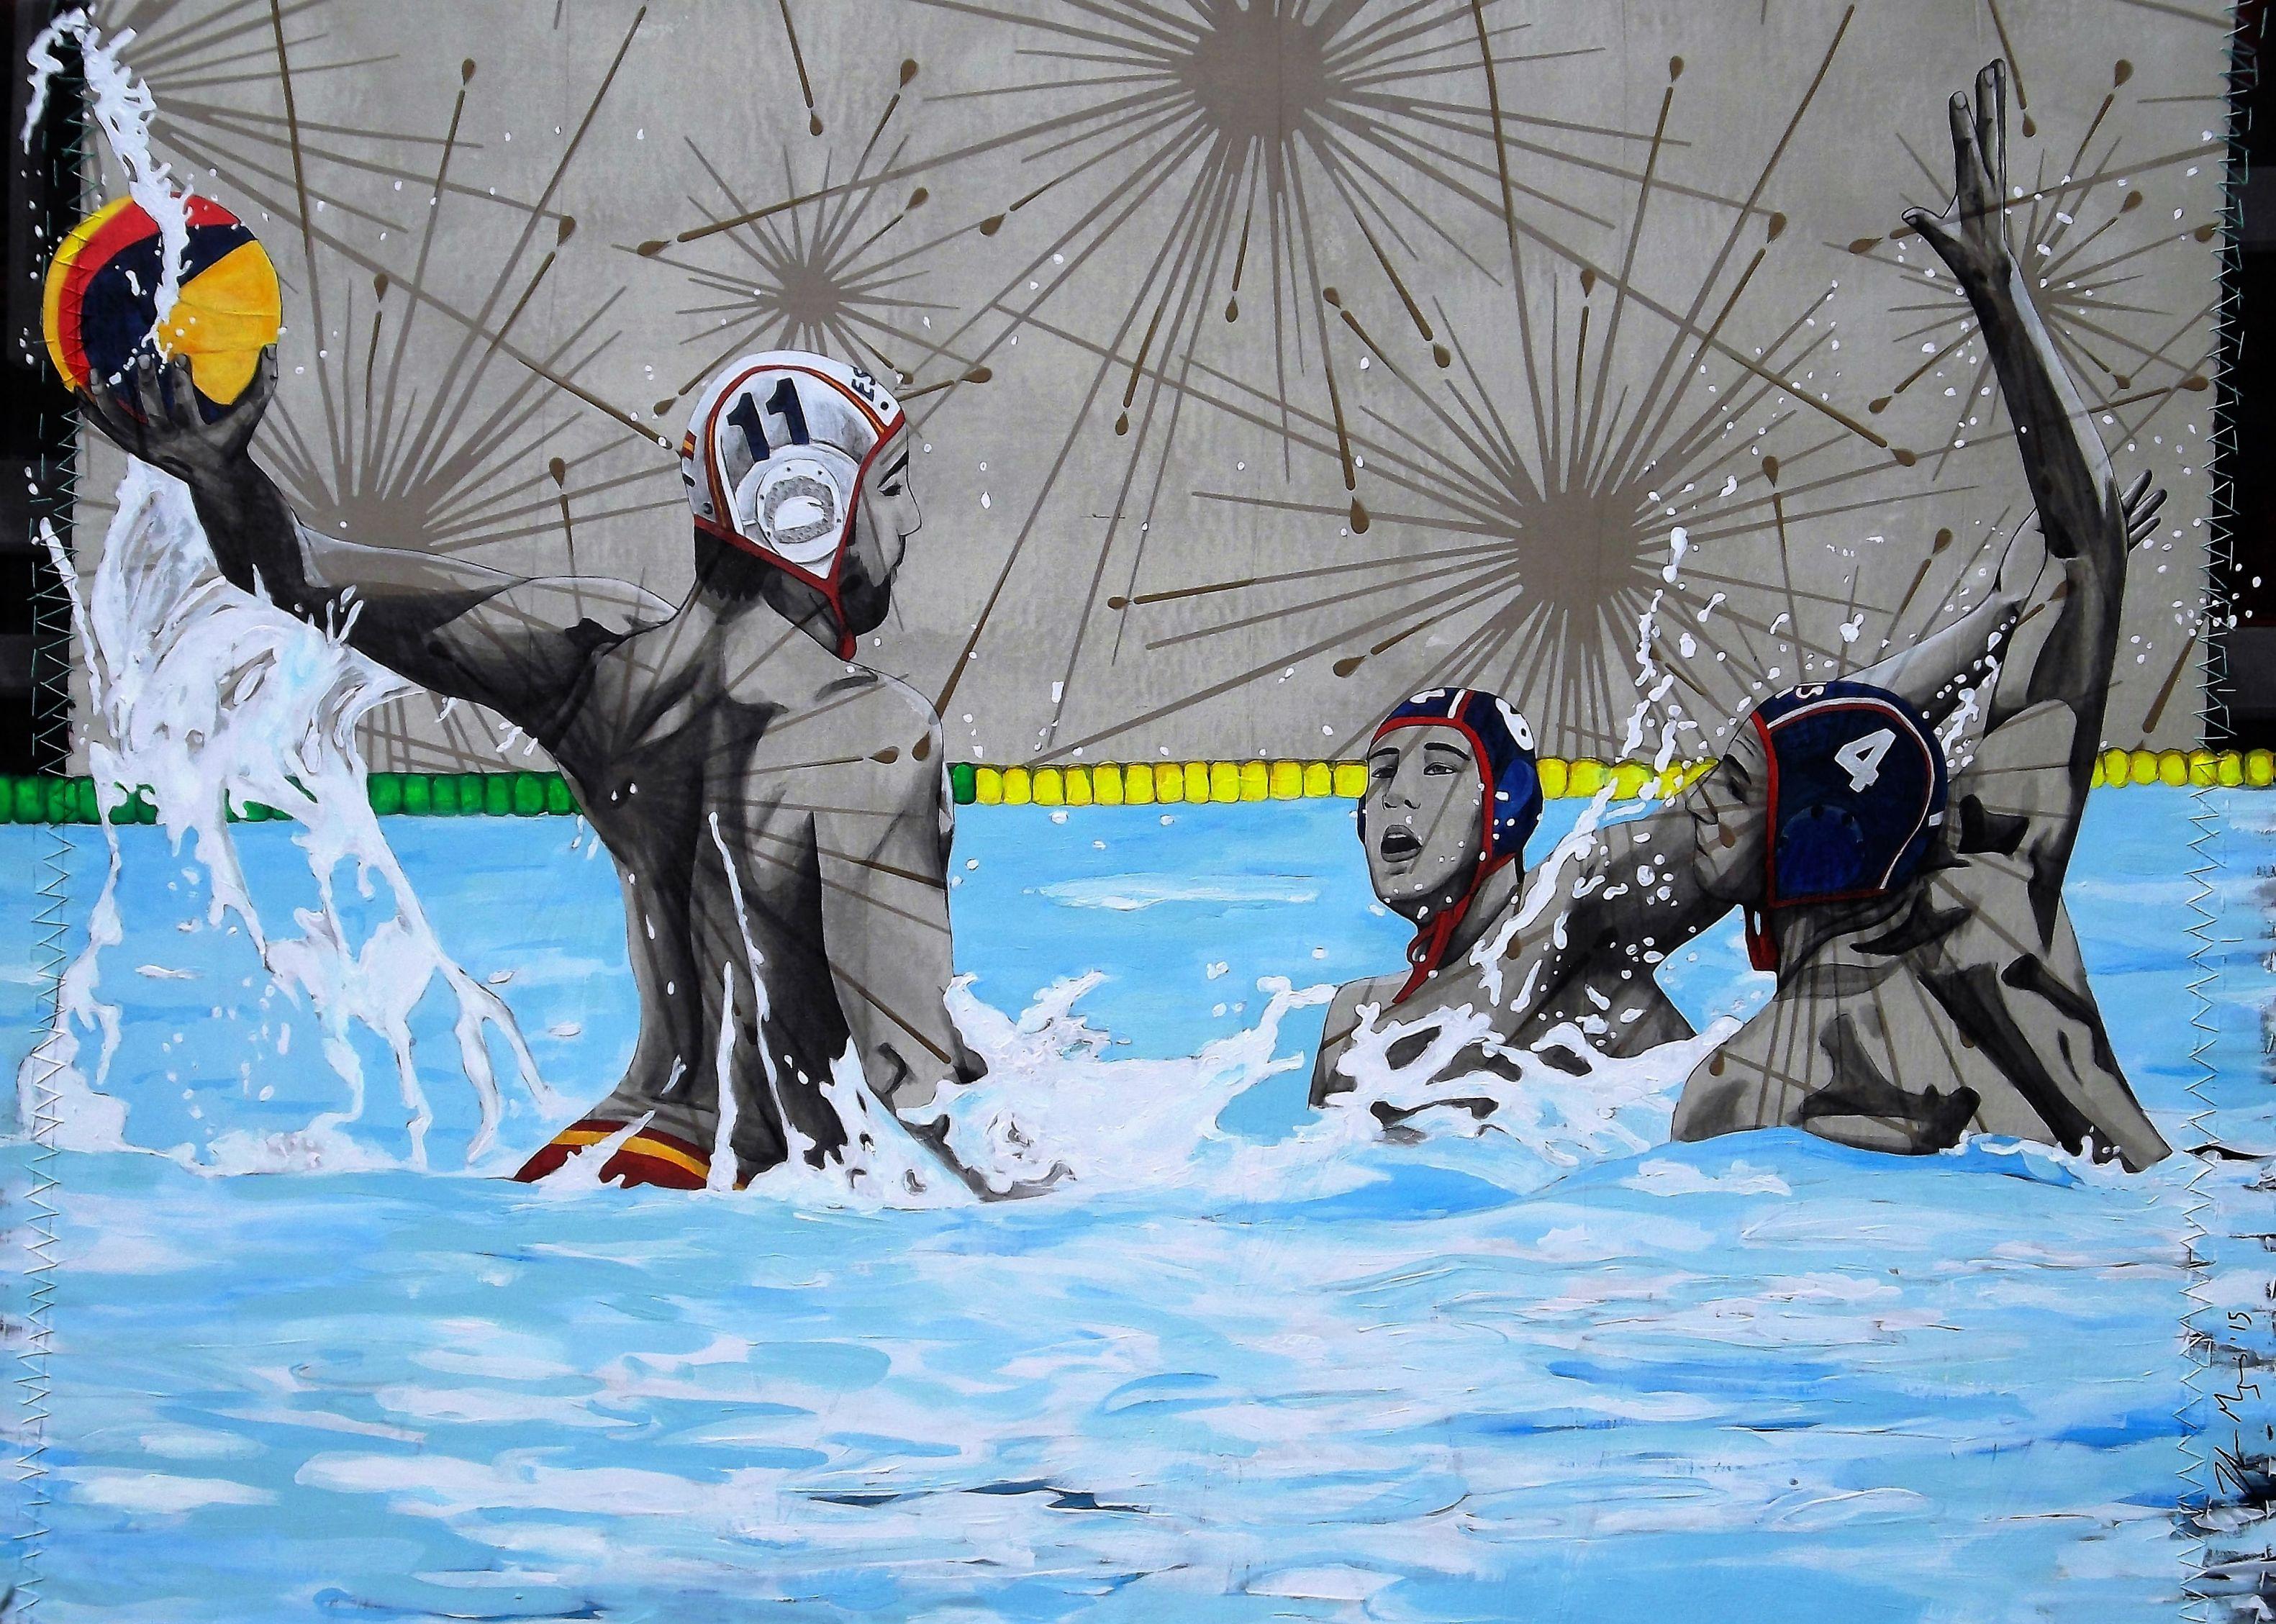 WATERPOLO SKIN (2015) - Julia Marqués Meyer